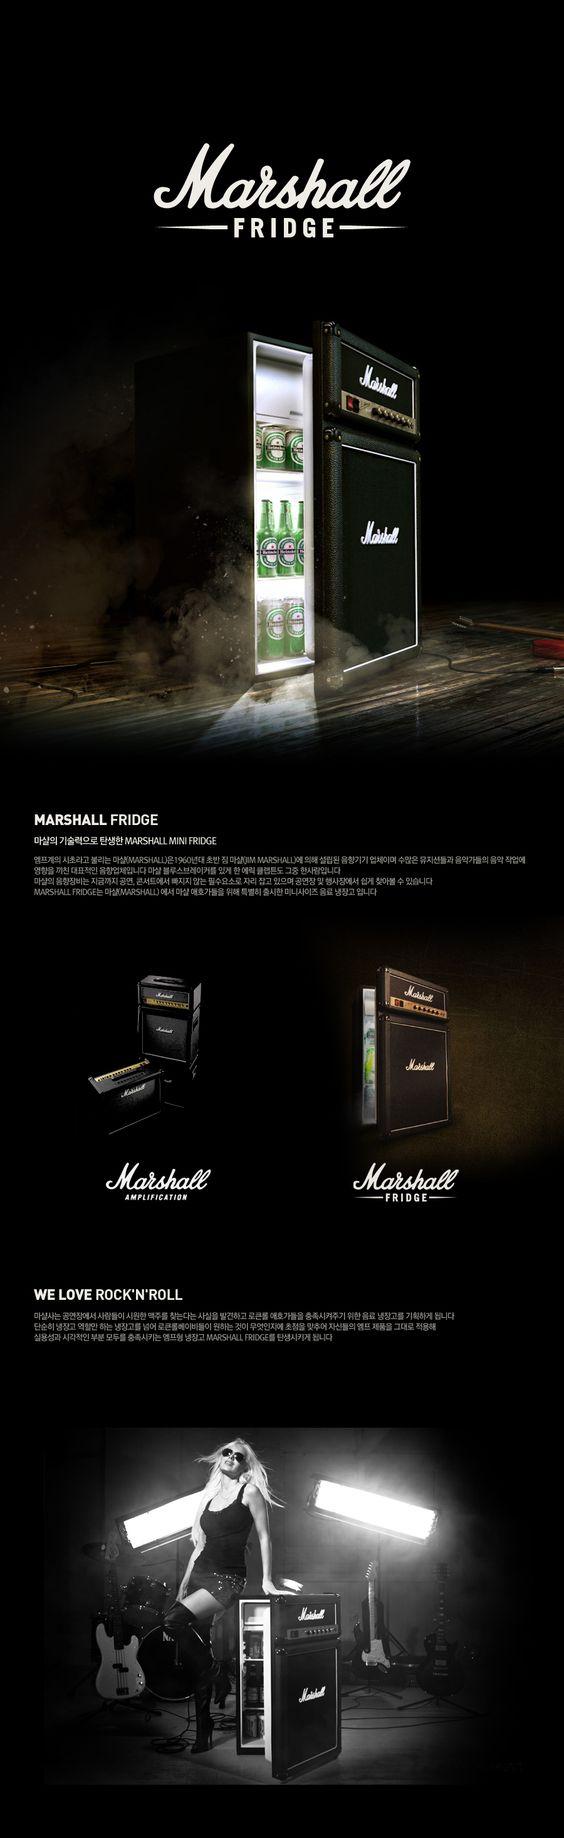 Home for the home marshall fridge - Marshall Fridge 1300k Com